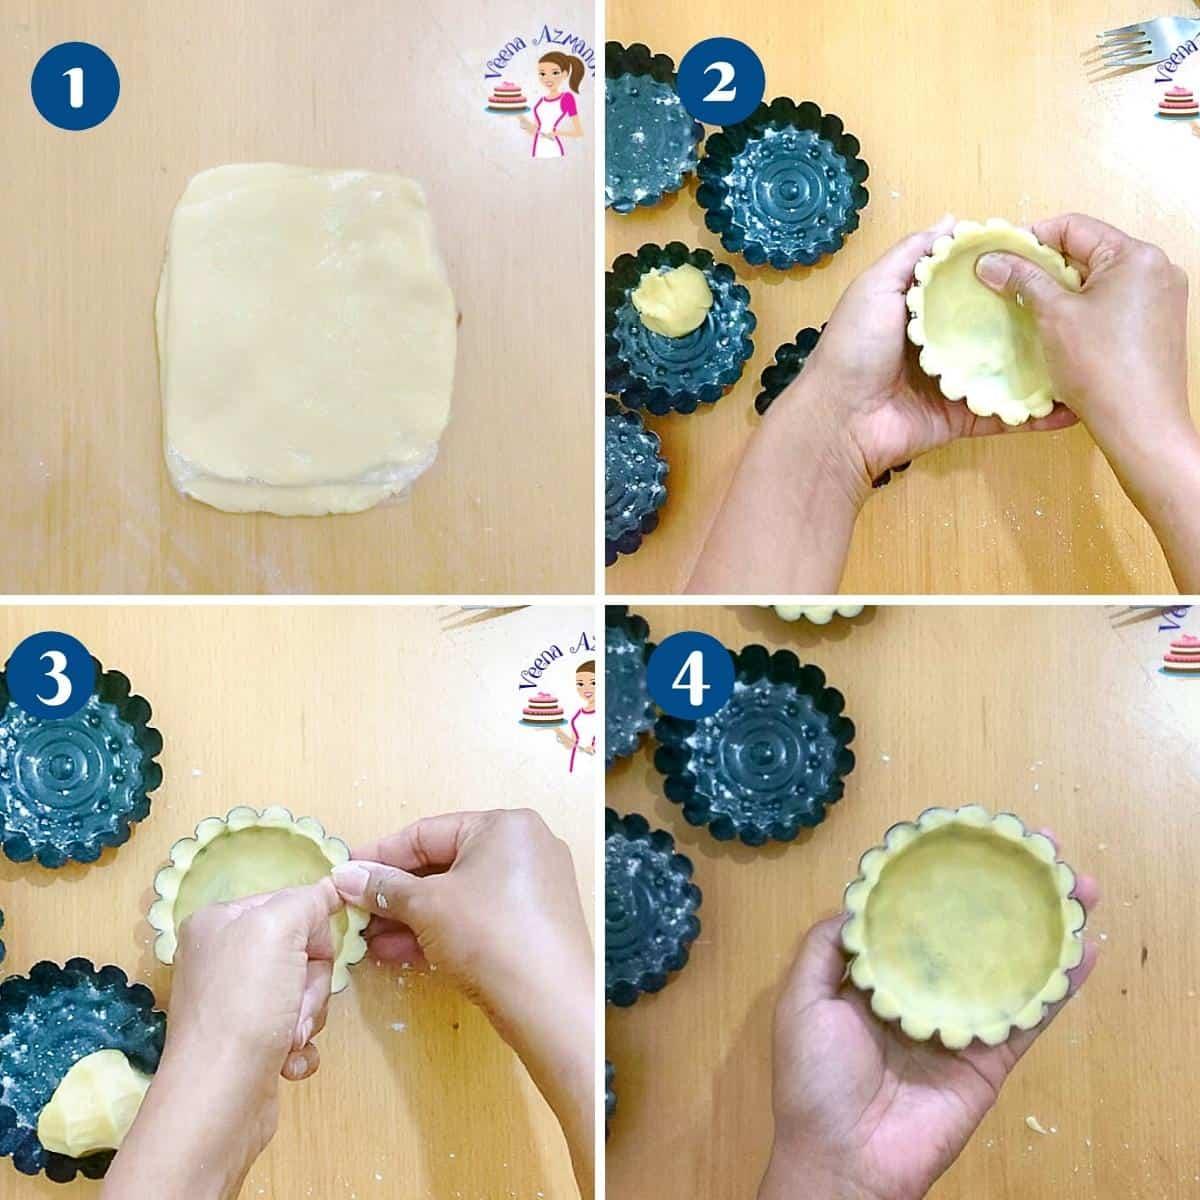 Progress pictures - Method 3 for making mini tart shells.